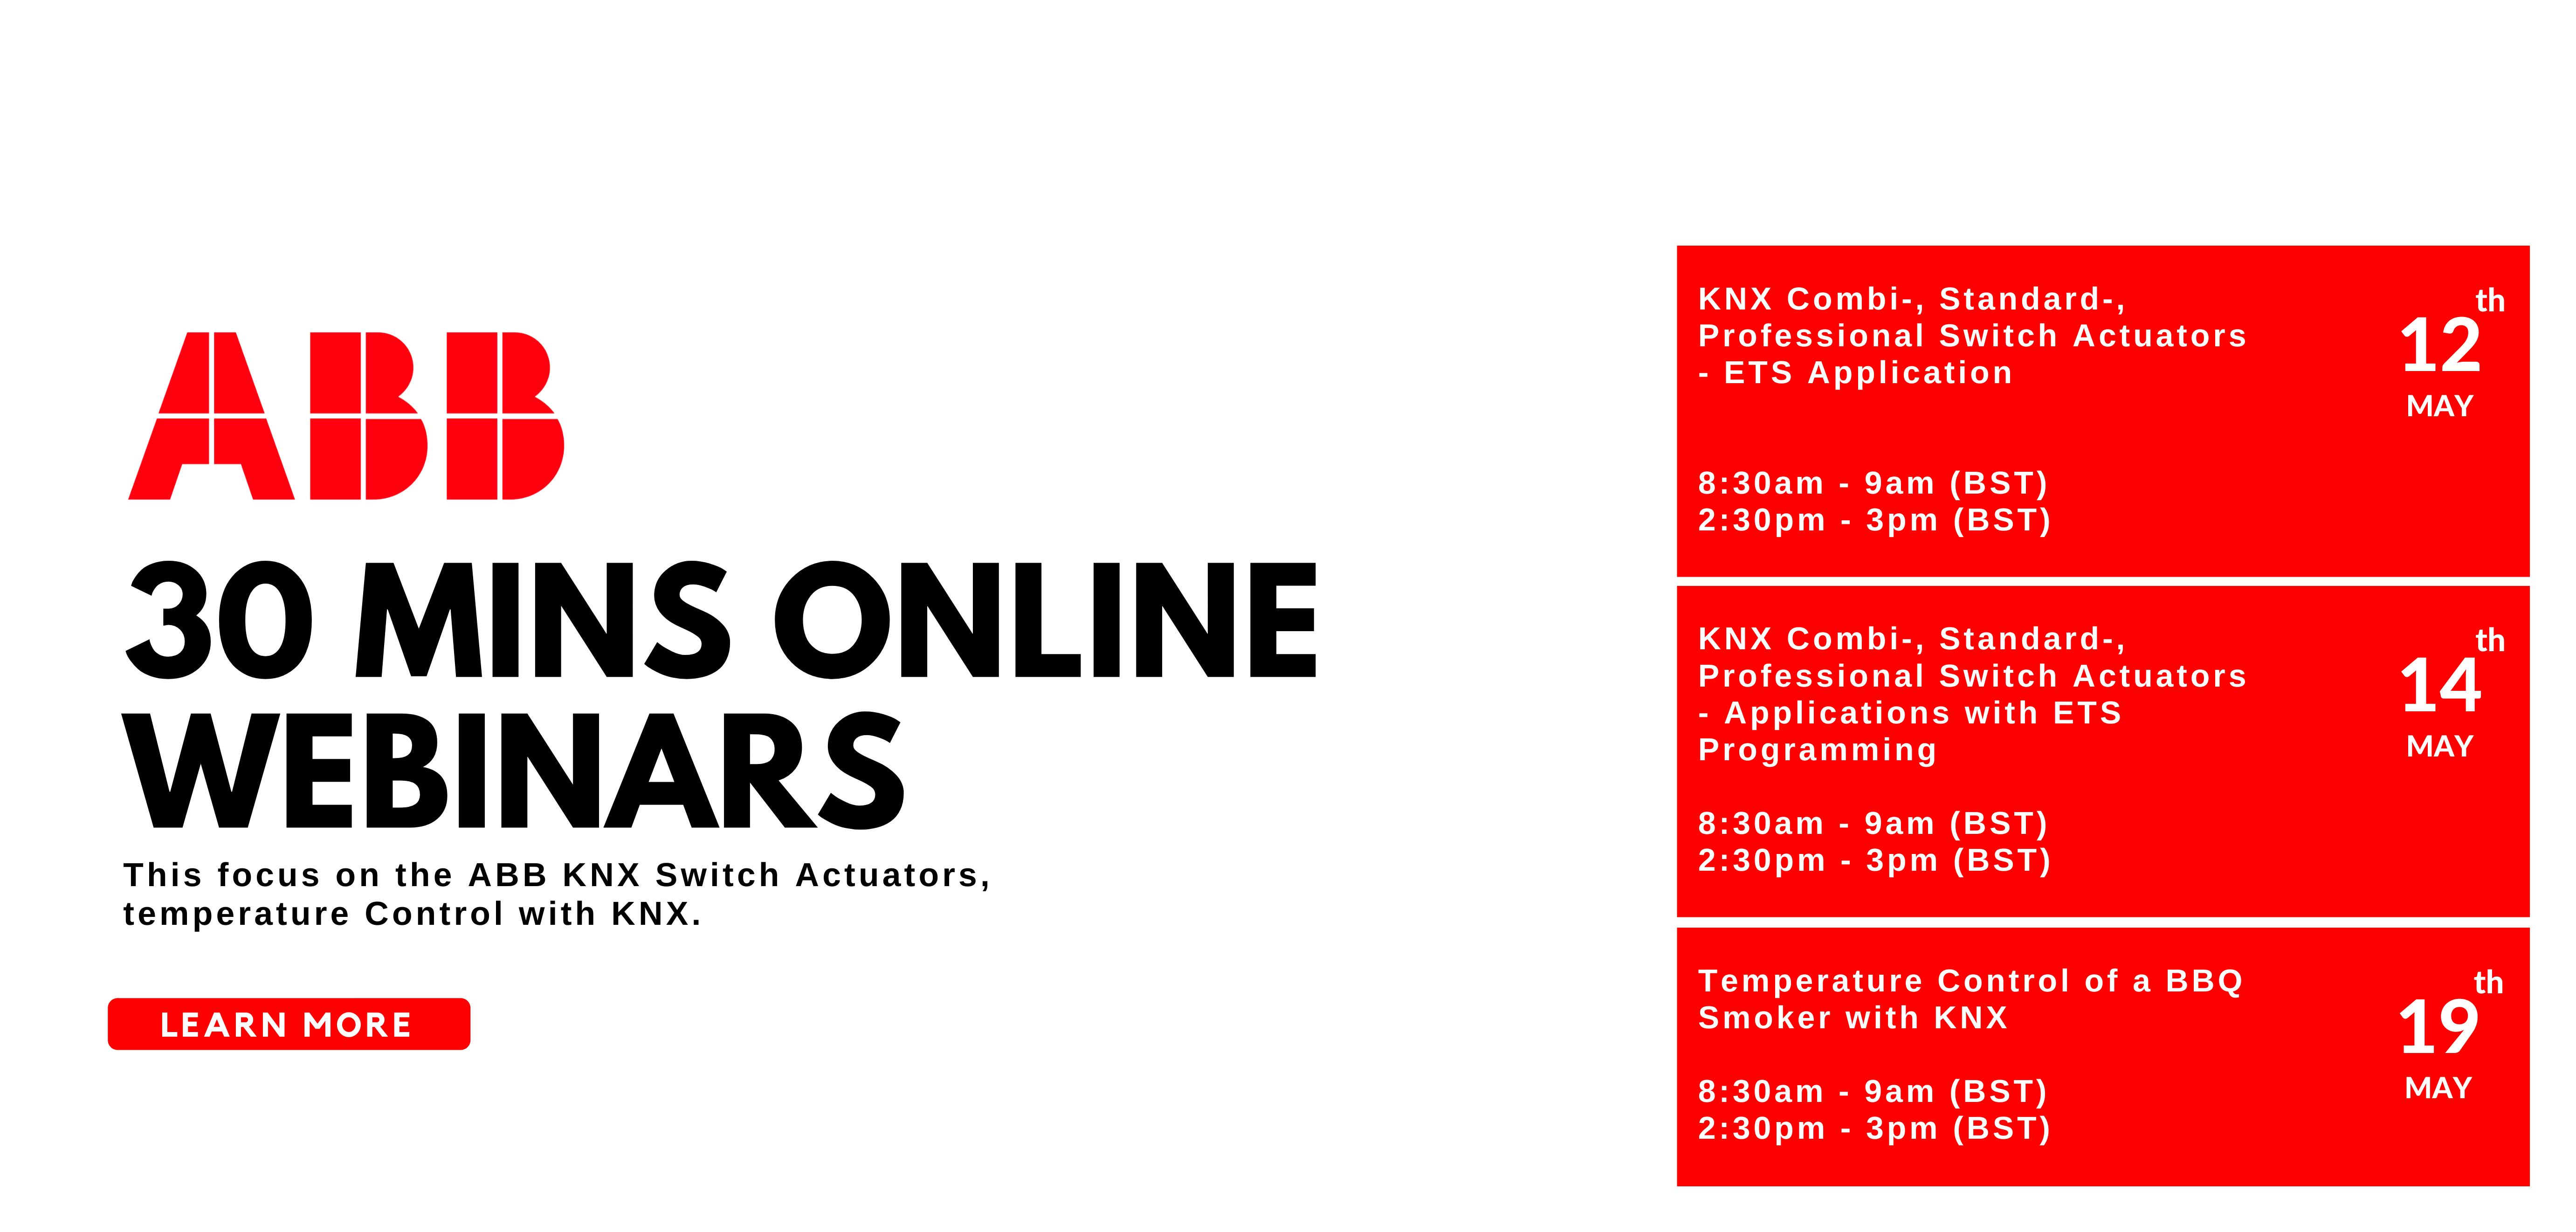 ABB 30mins online webianrs